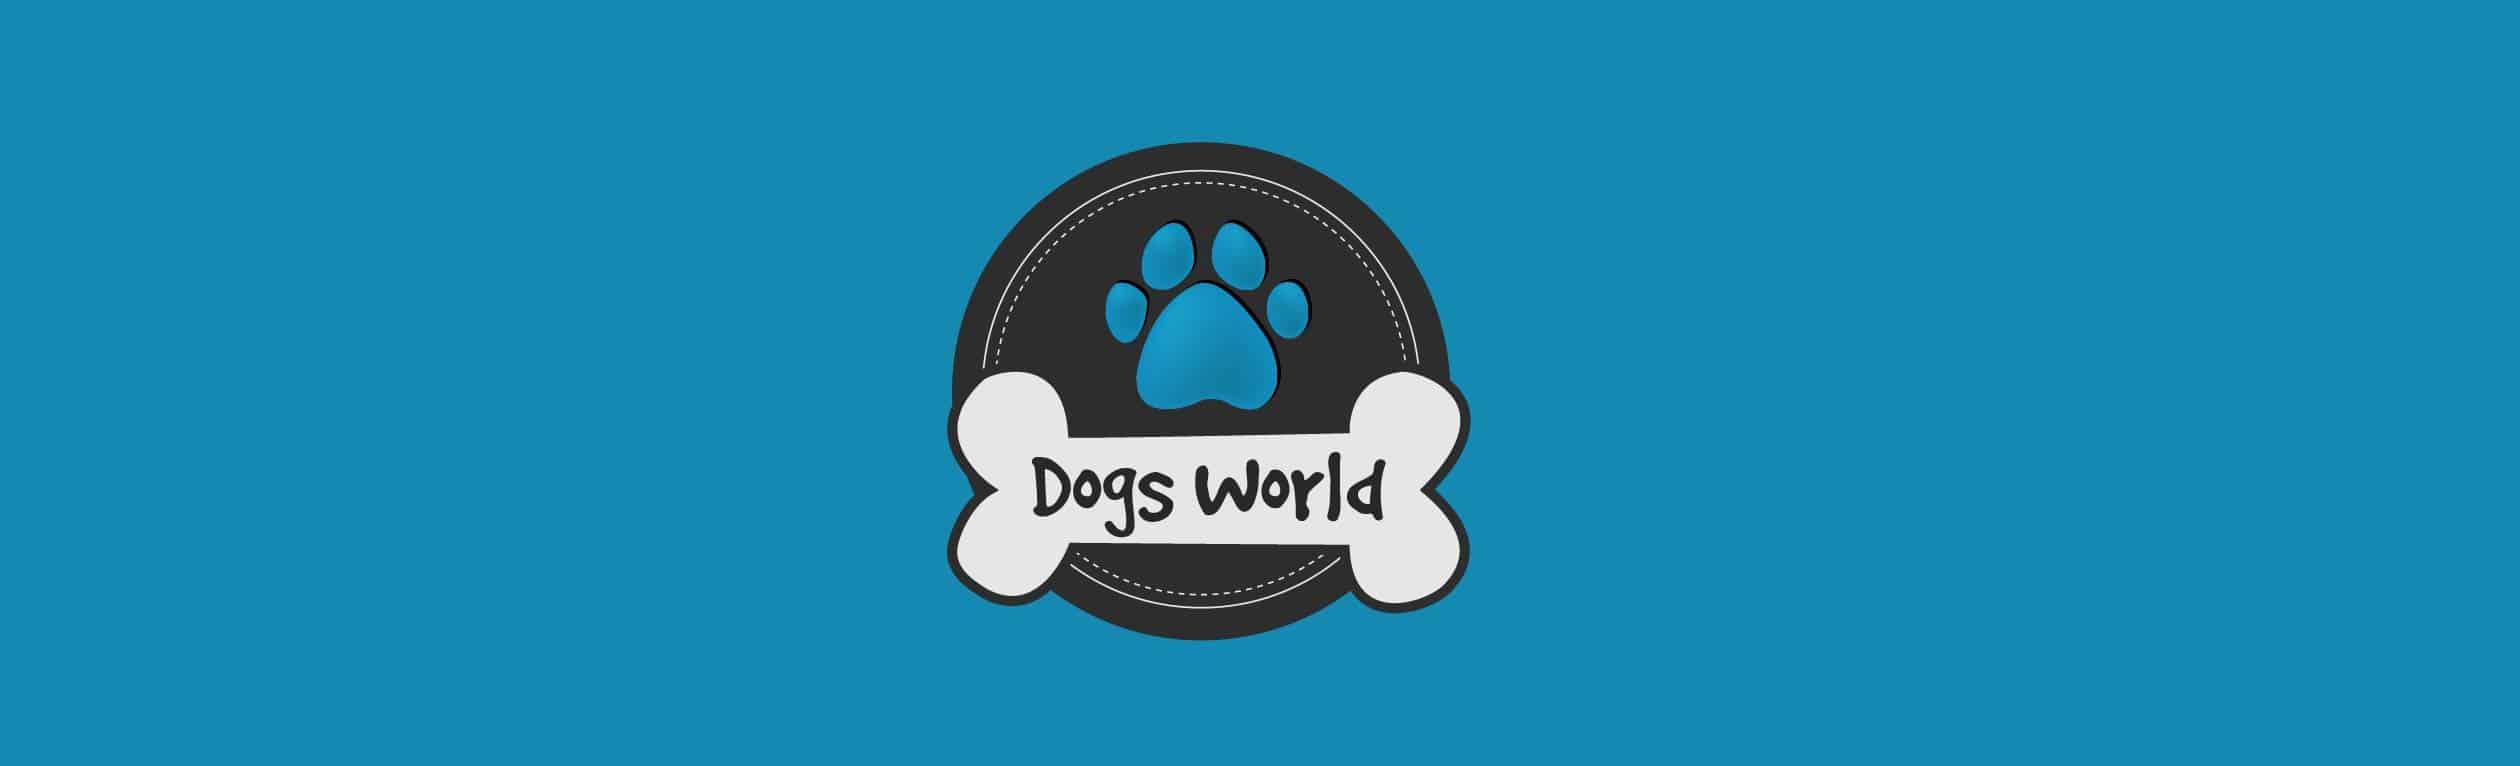 dogs world-01